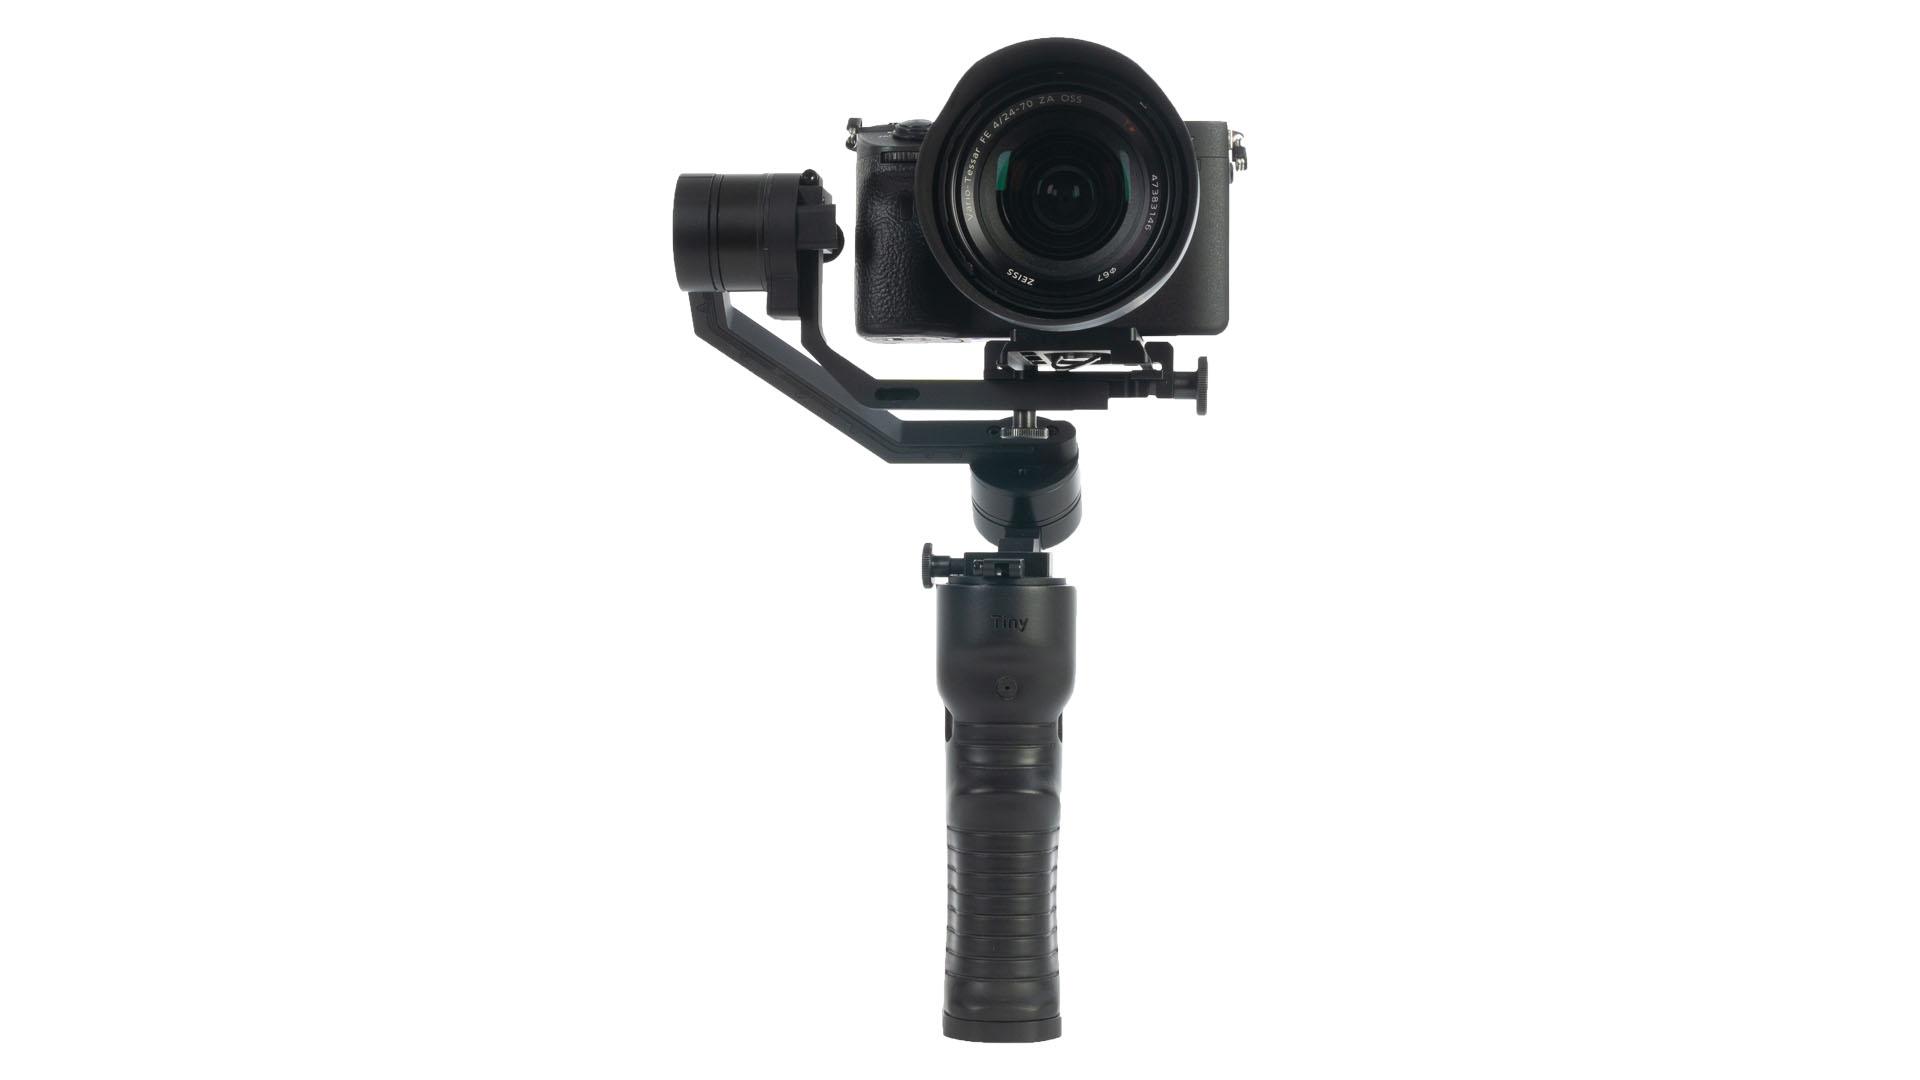 icecam gimbal mini ultravision 4